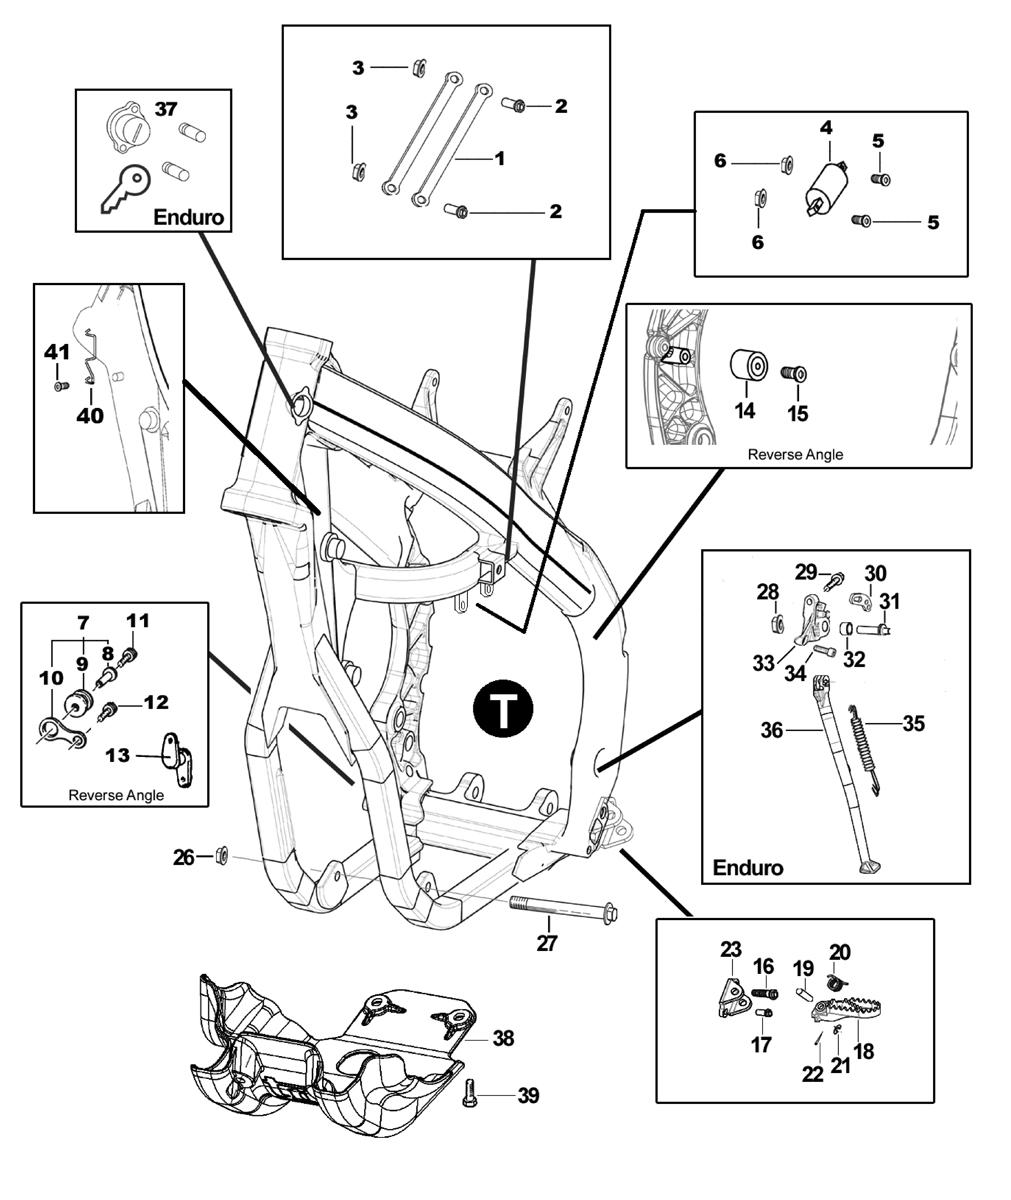 F18 Drawing